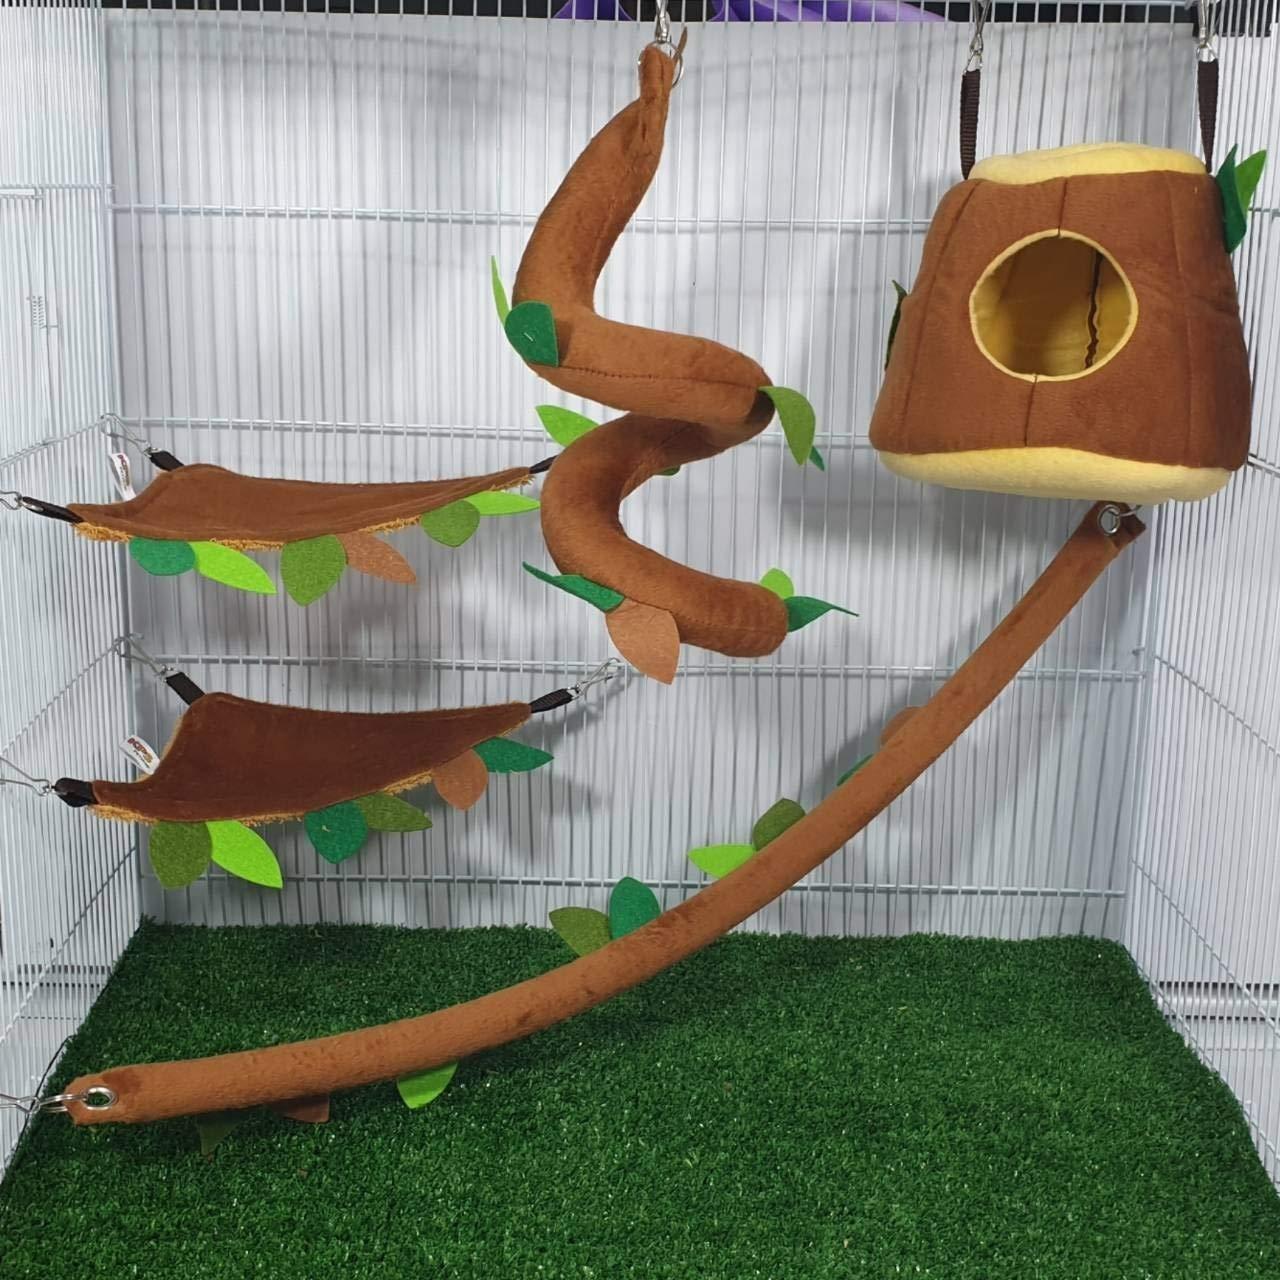 HOT! 5 Pcs Sugar Glider Hamster Squirrel Chinchillas Small Pet Cage Set Hanging Vertical Log Forest Pattern Get Free 1 Small Pet Treats, Polar Bear's Republic (Light Brown Set) by Polar Bear's Pet Shop